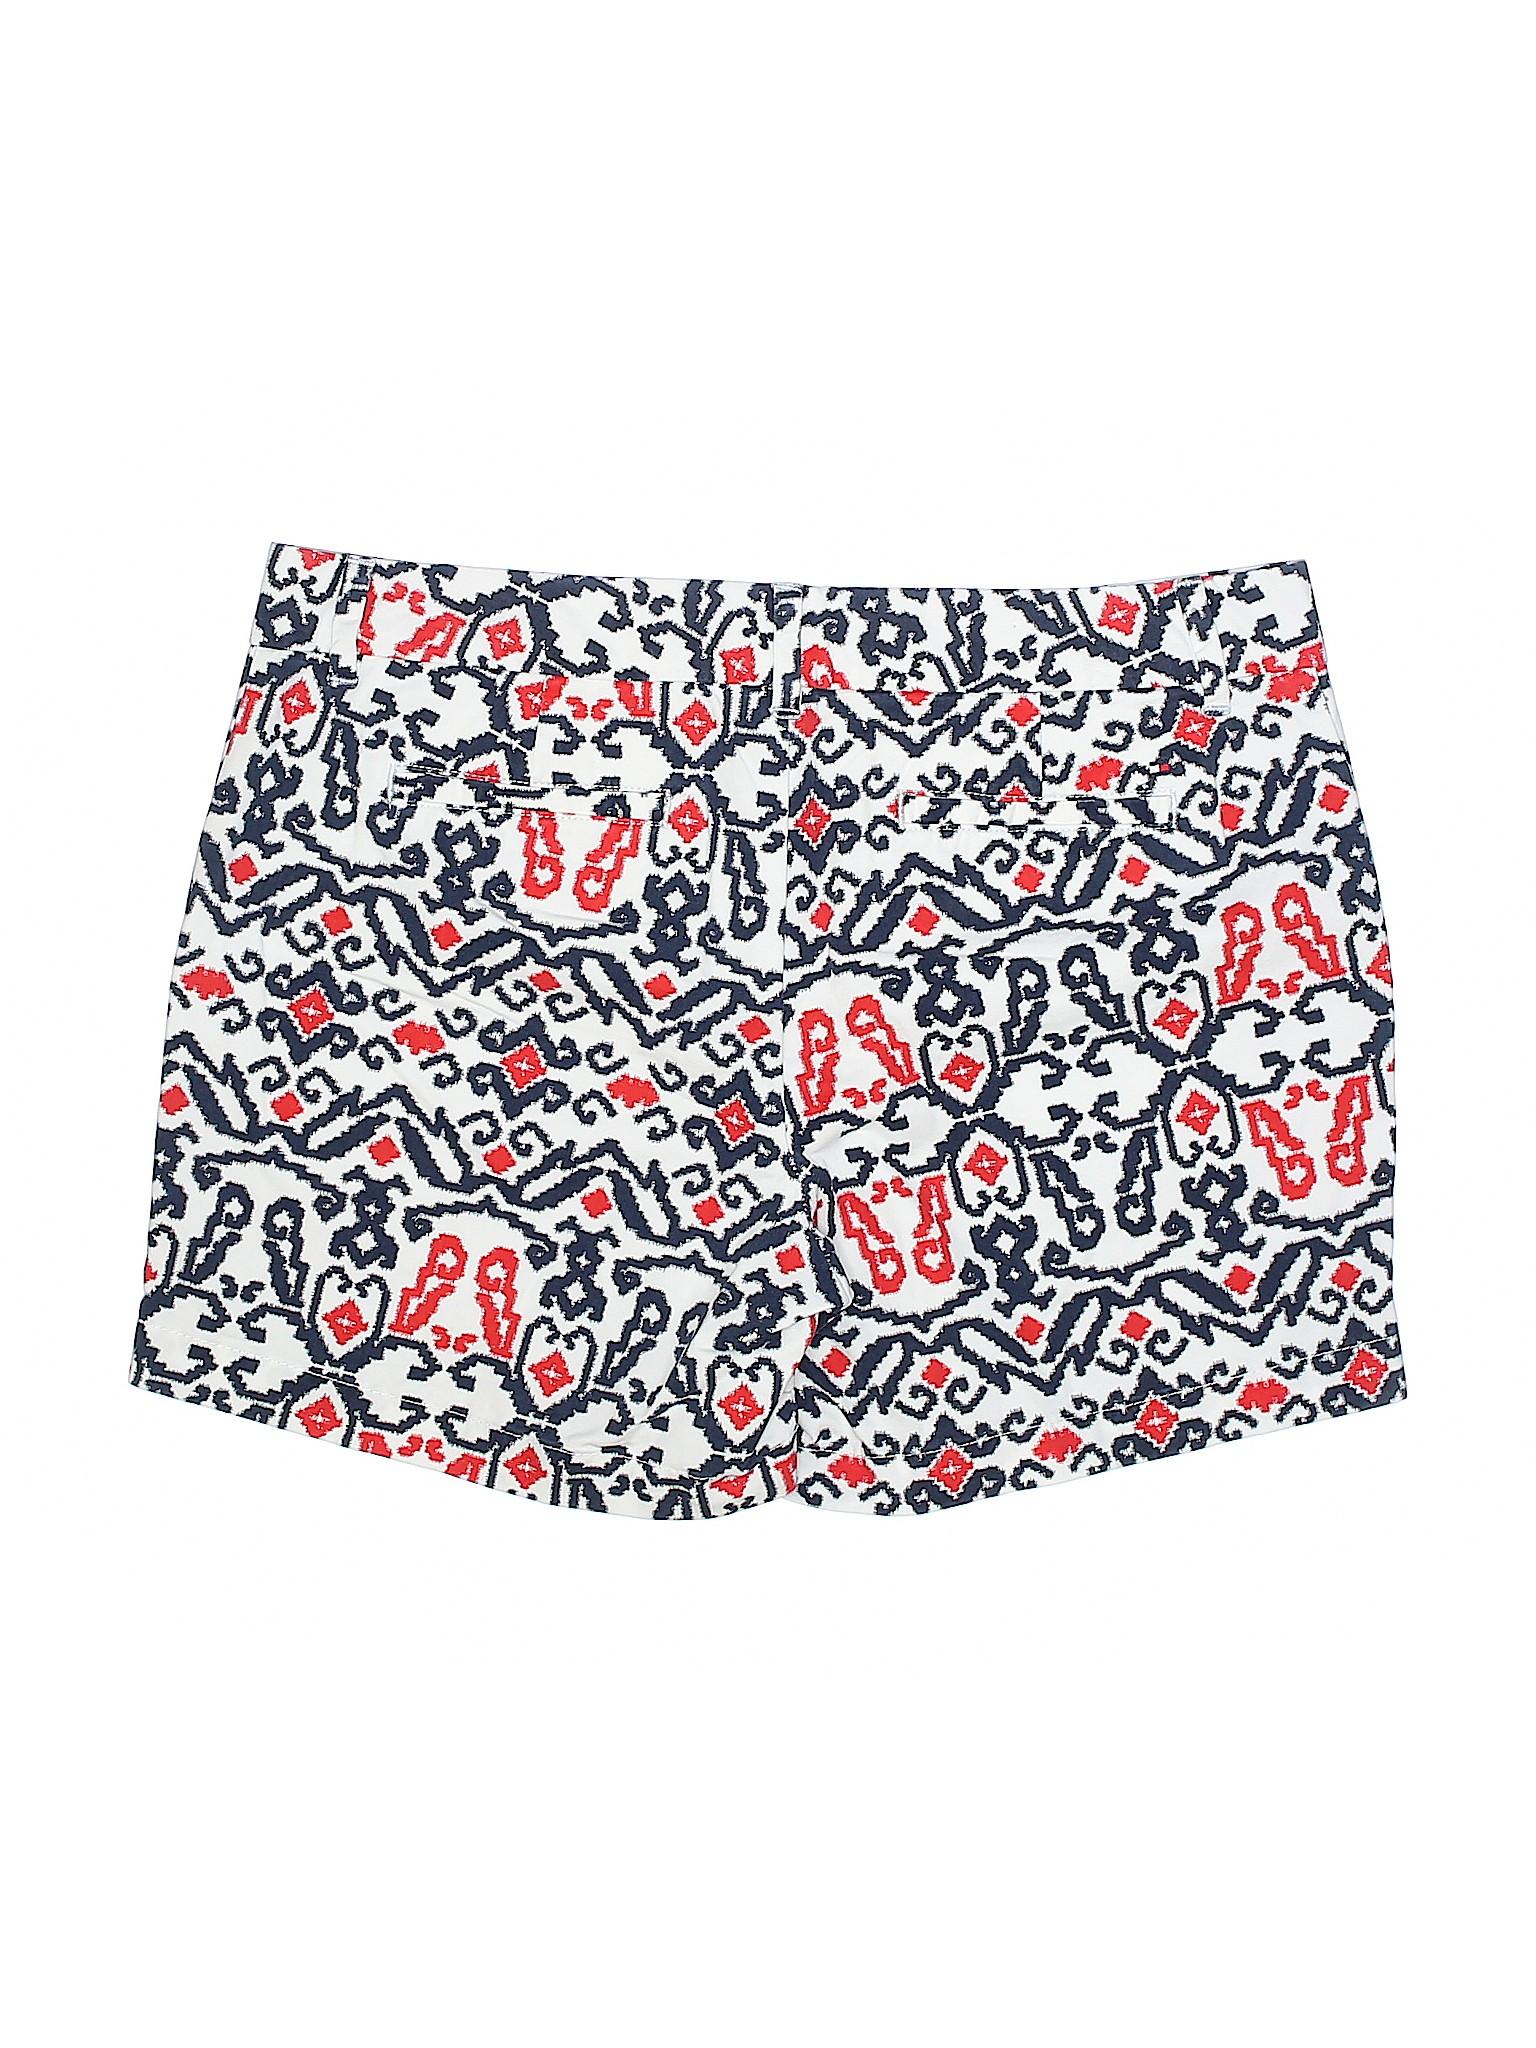 Boutique Khaki Tommy Hilfiger leisure Shorts wPgw8Tq